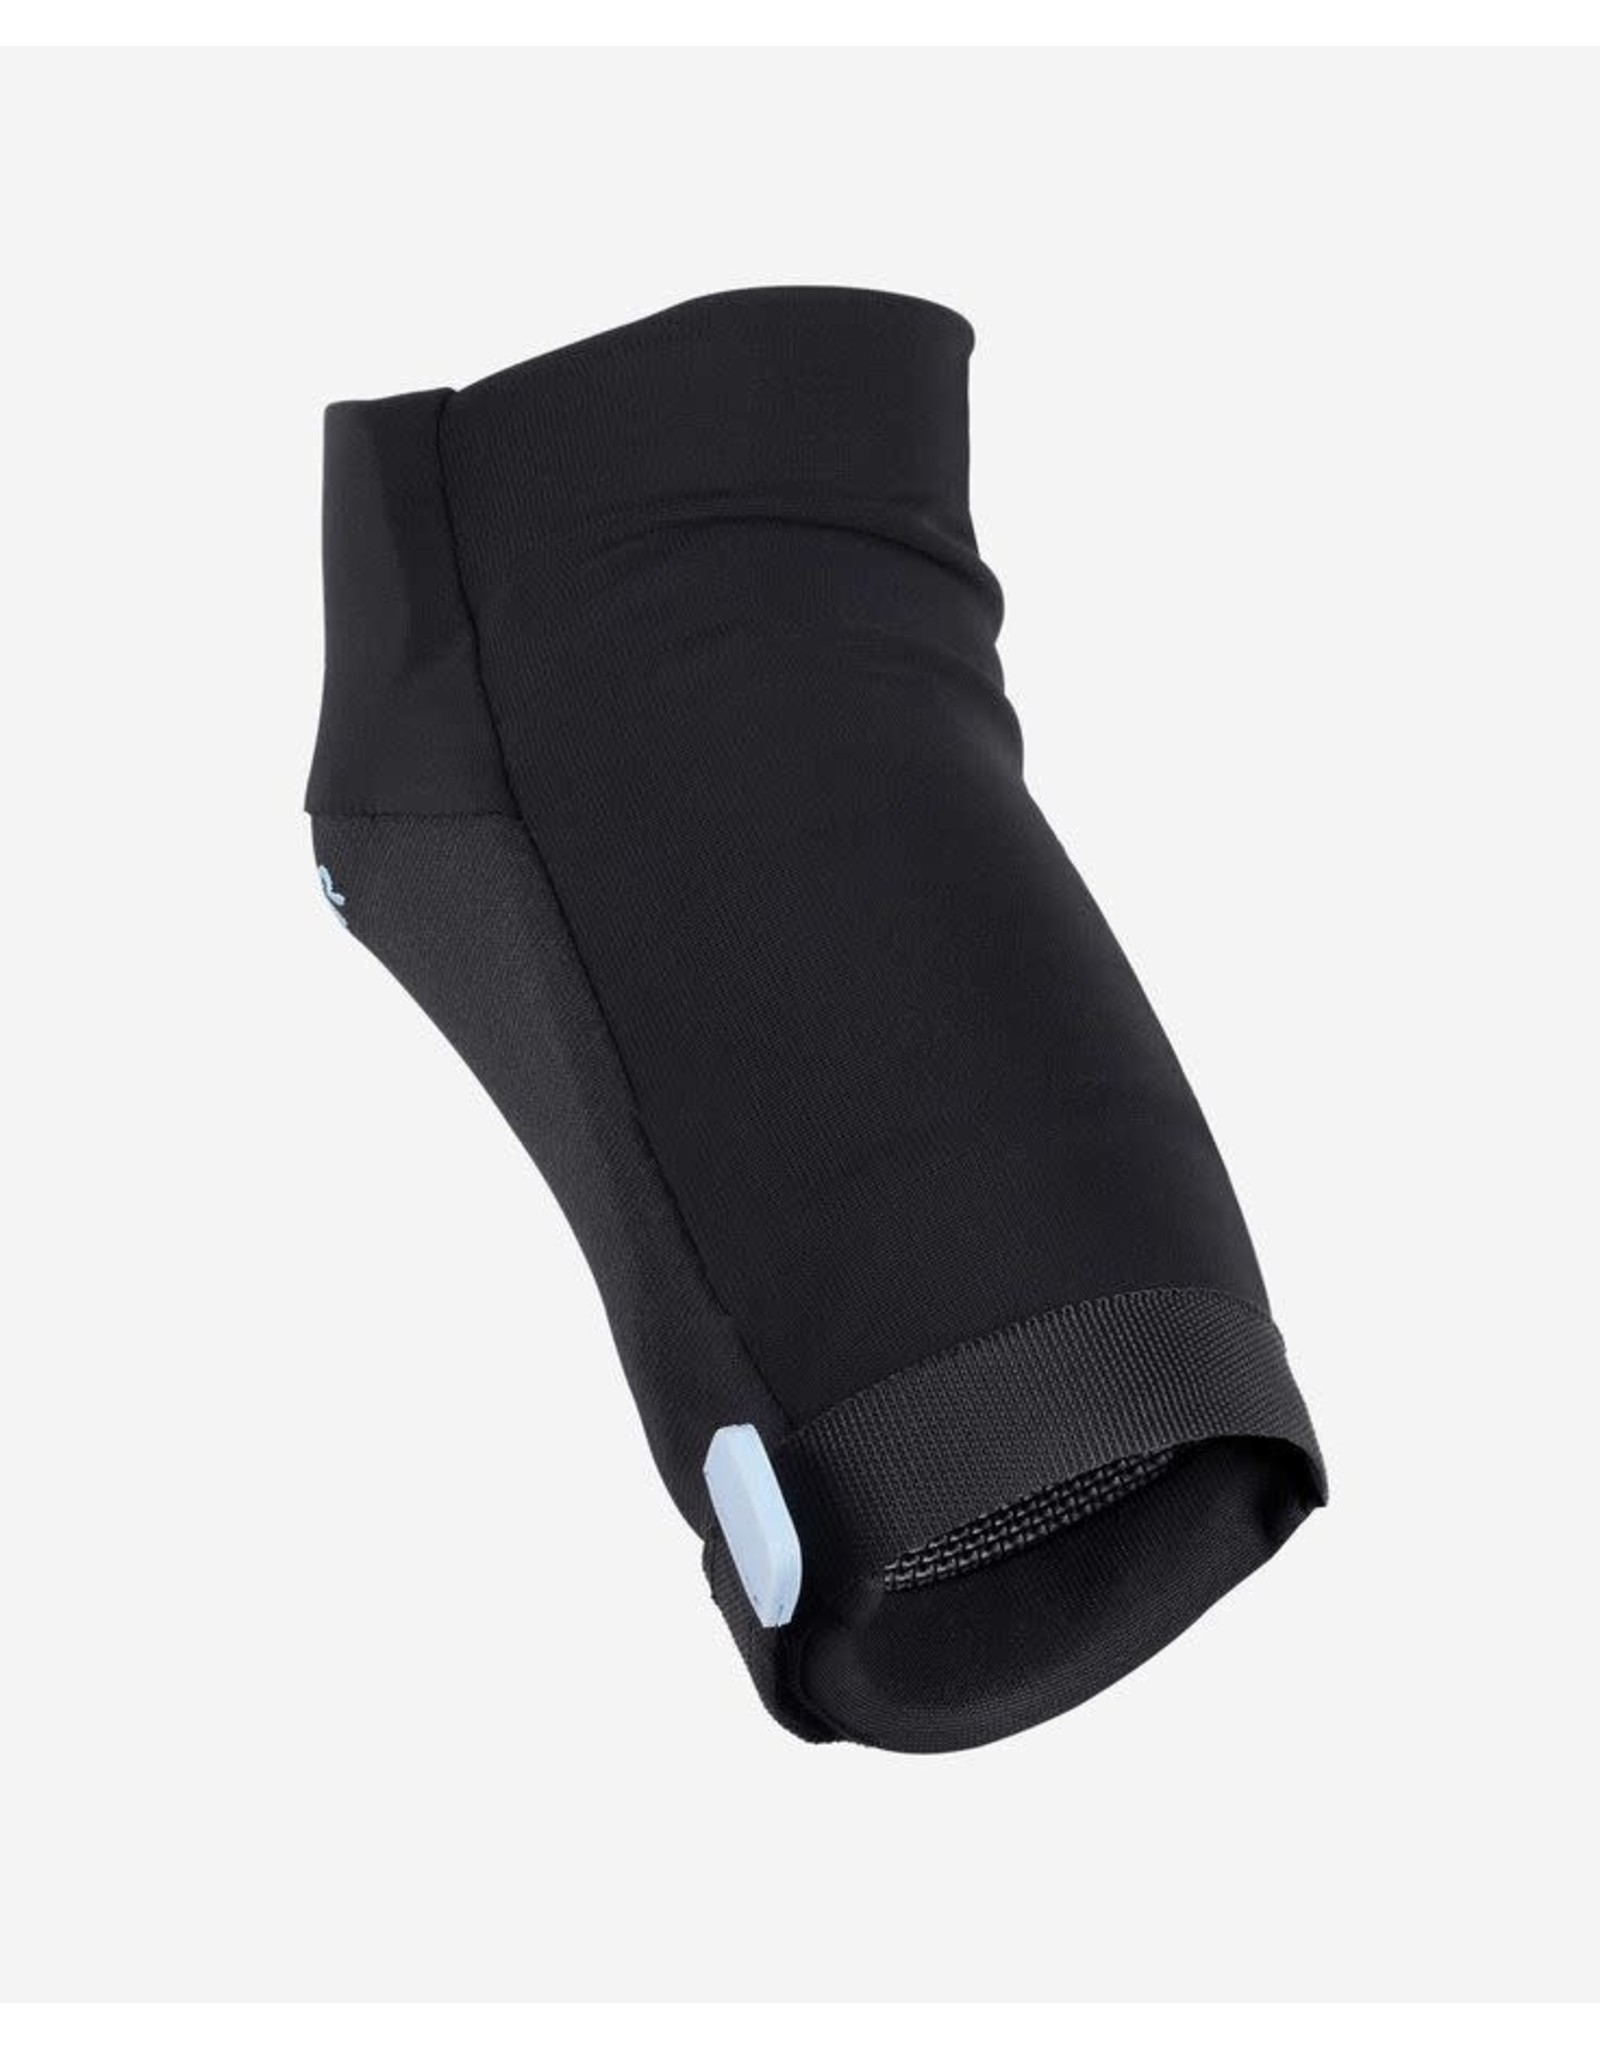 POC Elbow pads POC Joint VPD Air